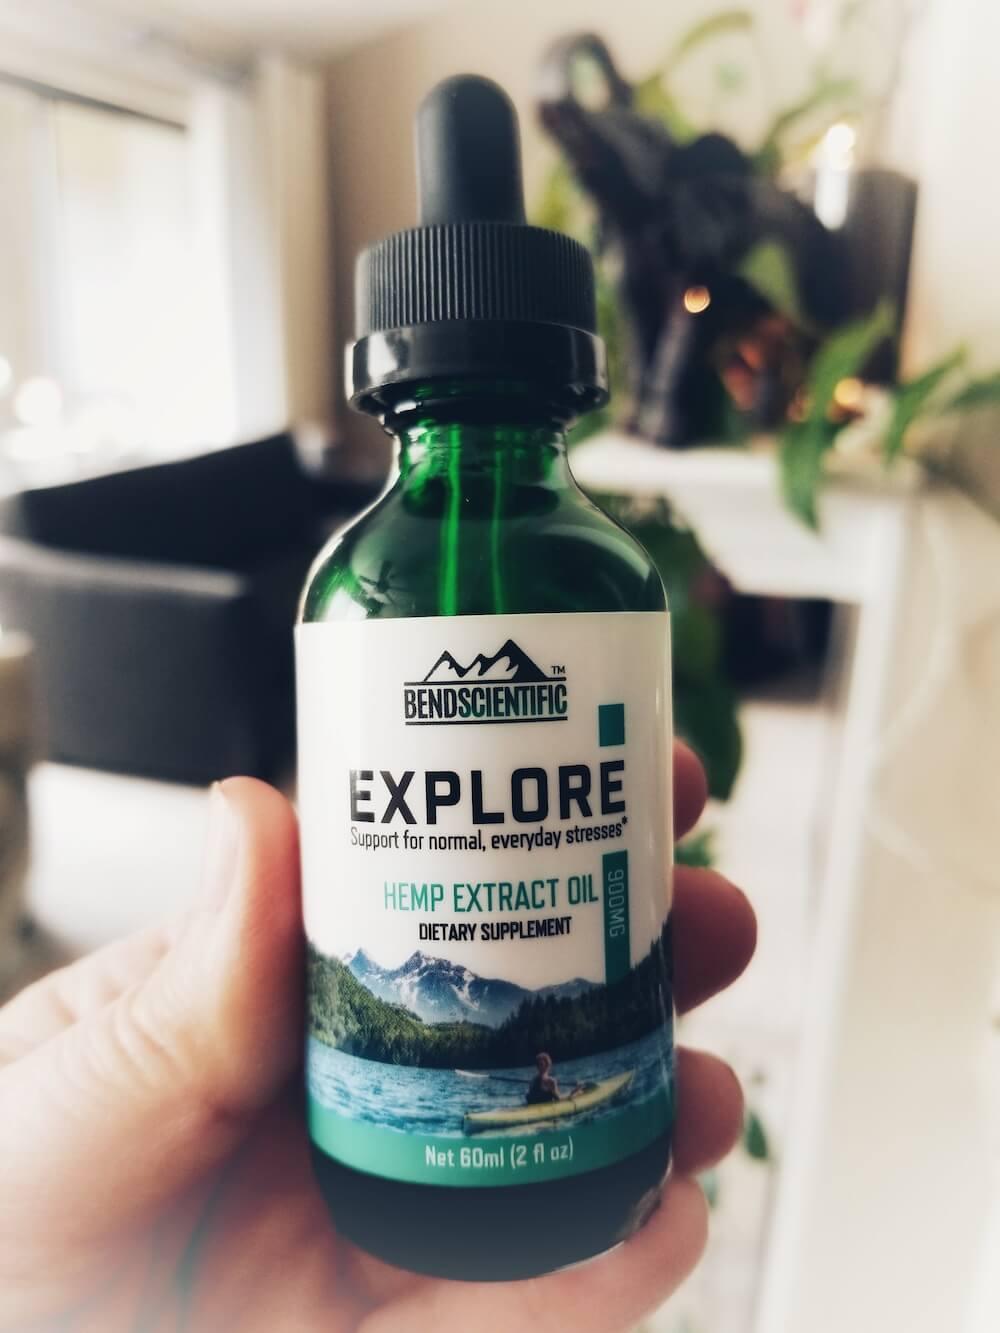 Explore Hemp Extract Oil by Bend Scientific